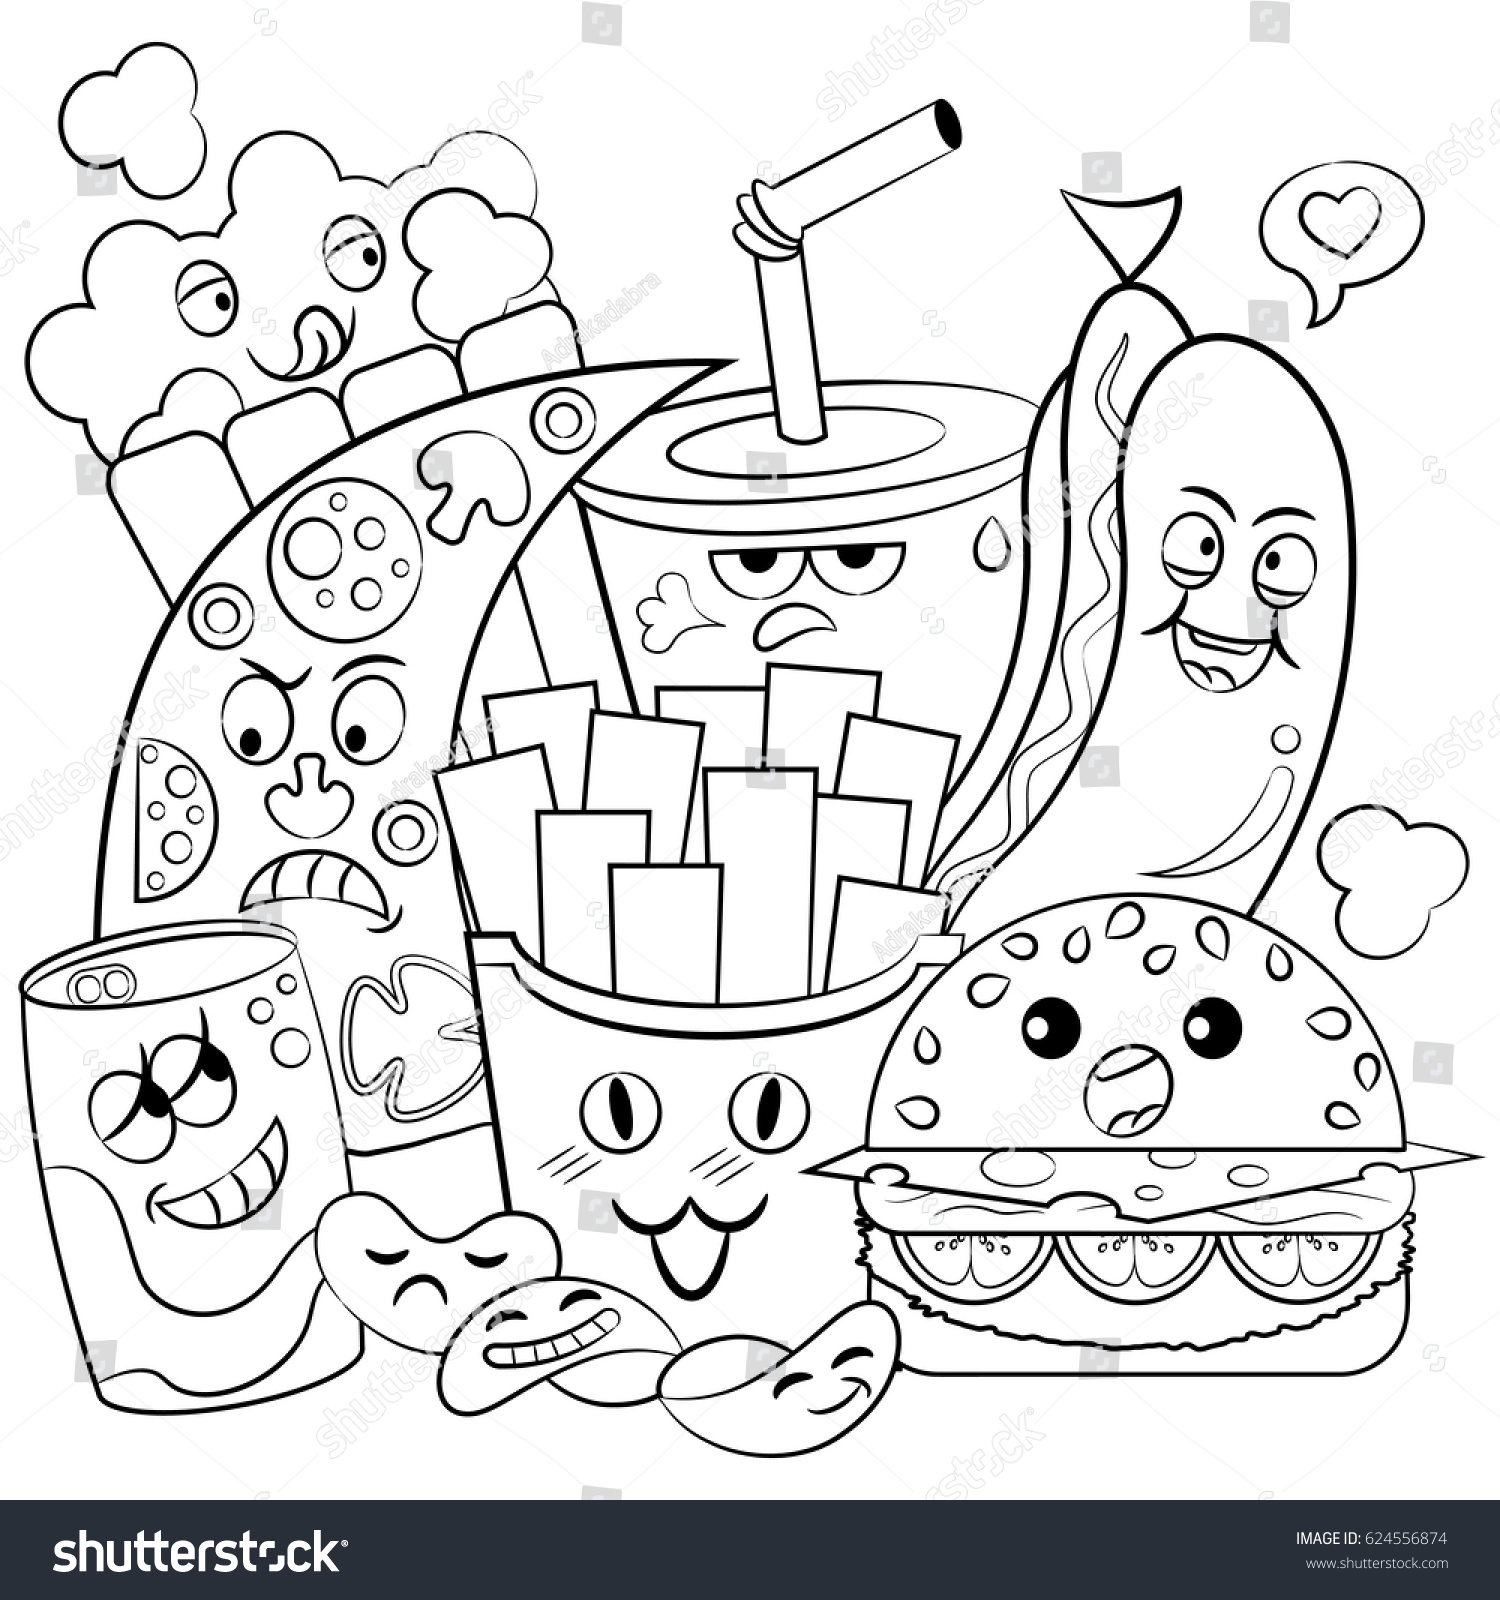 Doodle Art Food Doodle Color